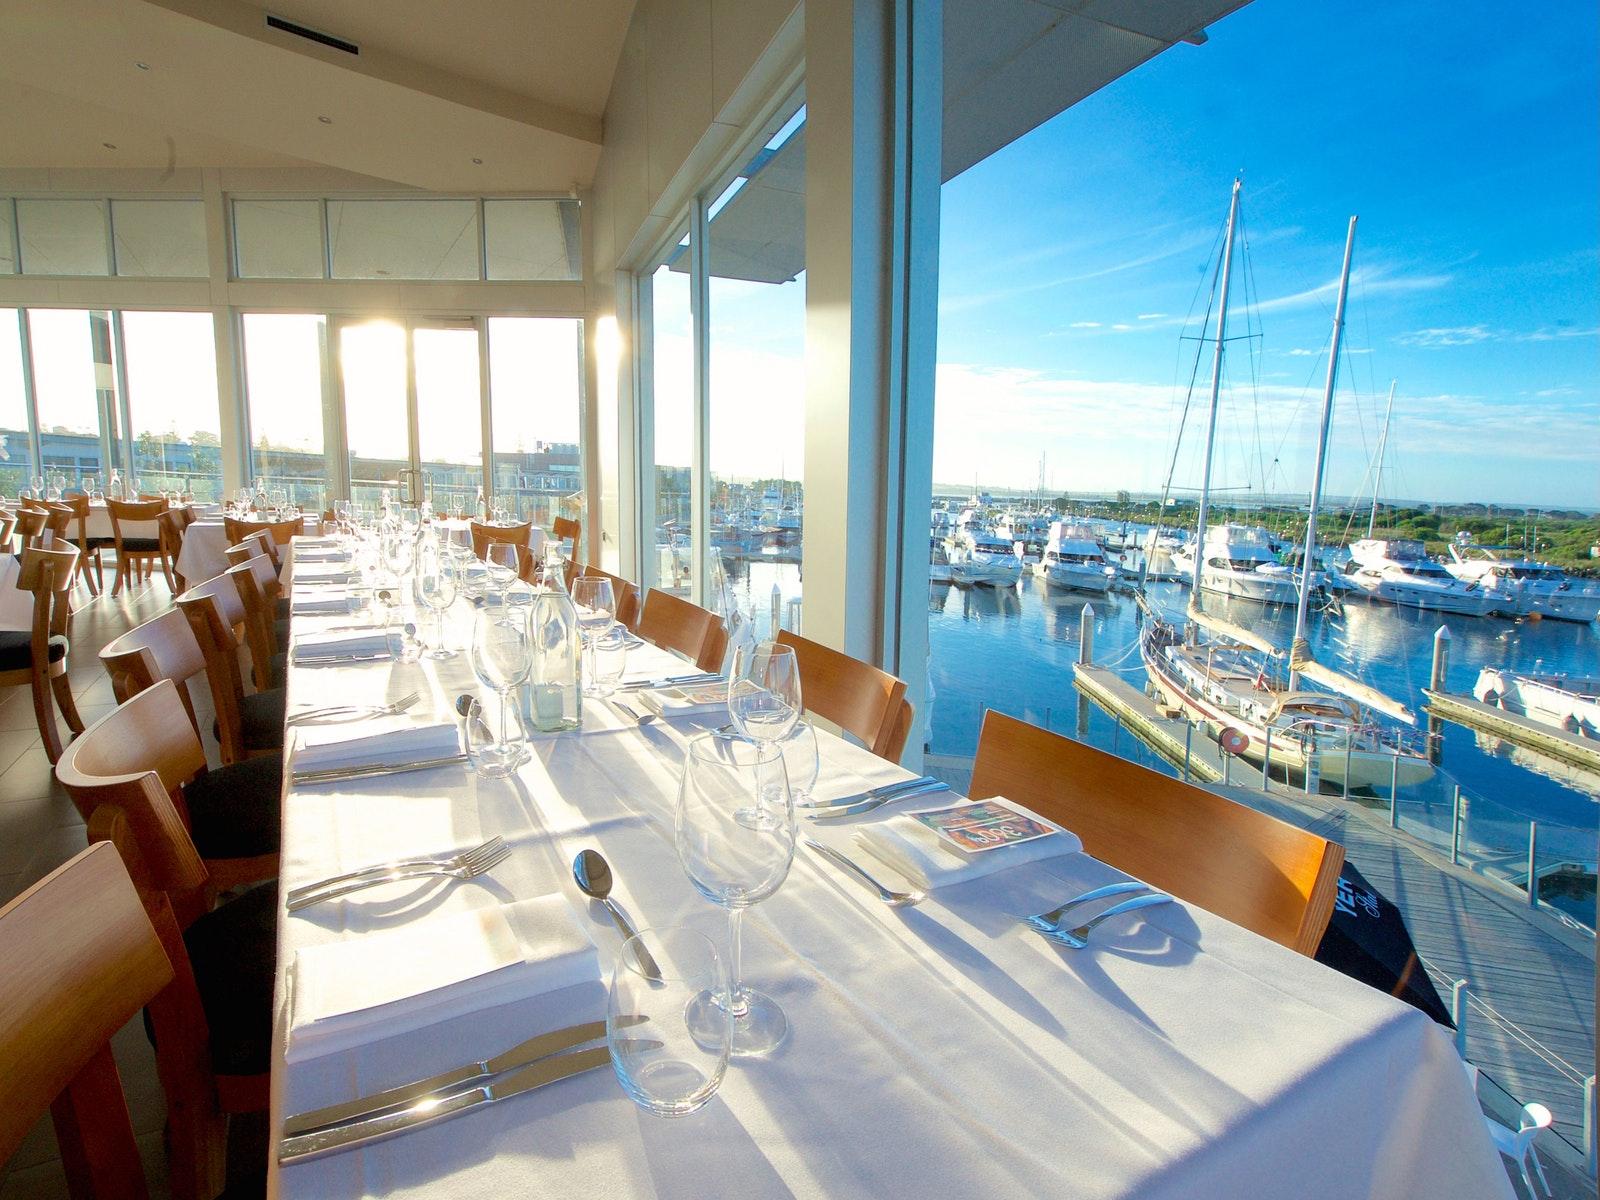 360Q restaurant and wedding functions venue at Queenscliff